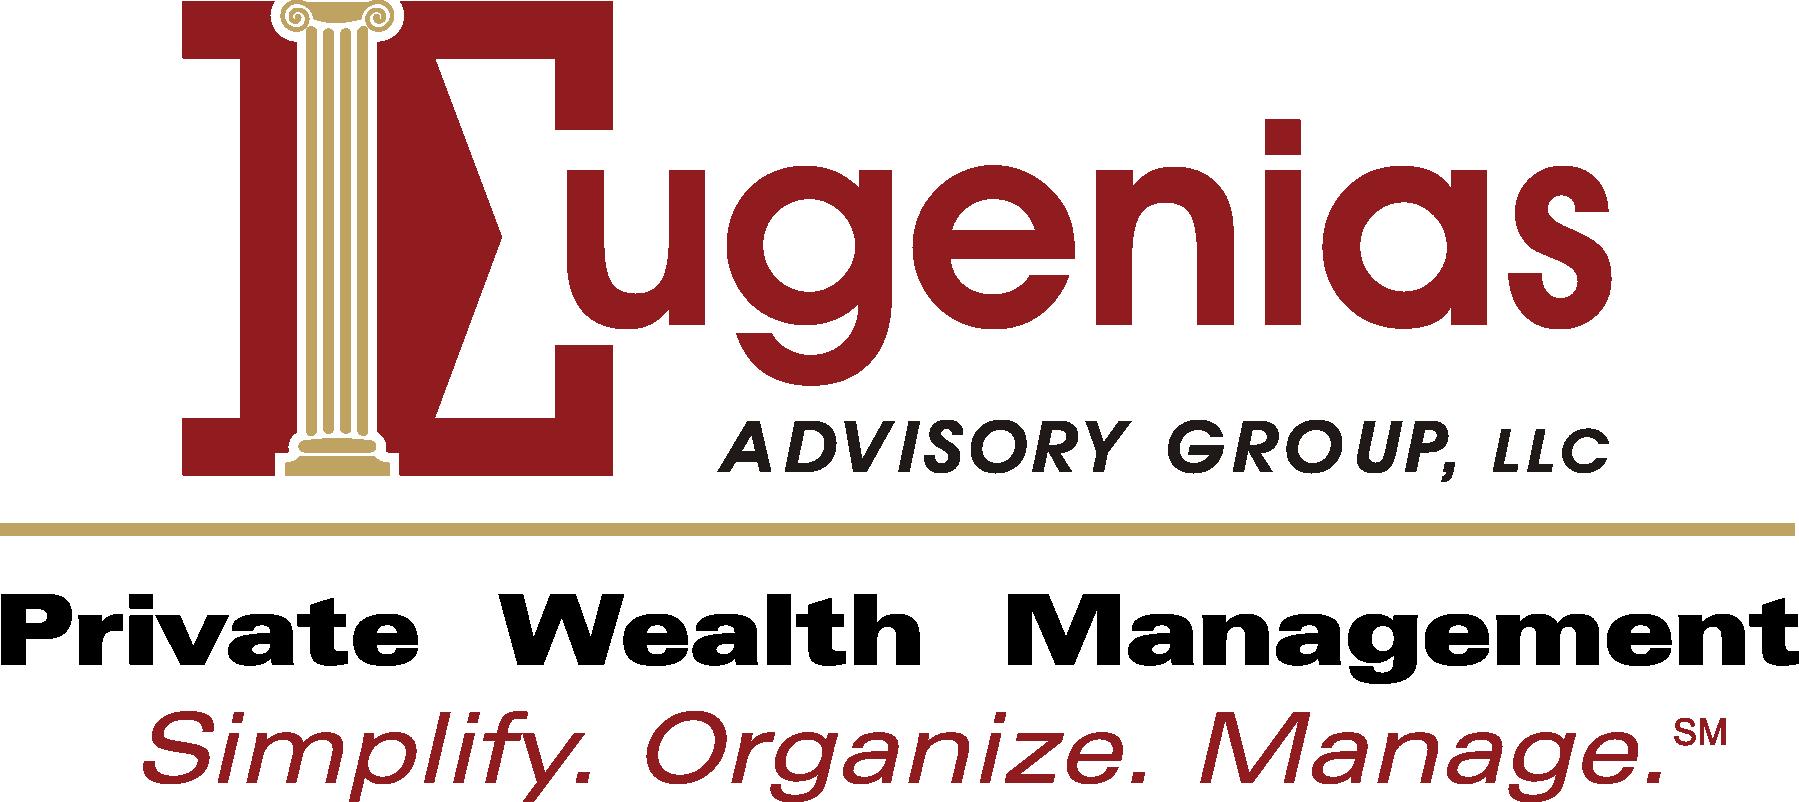 Logo for Eugenias Advisory Group, LLC